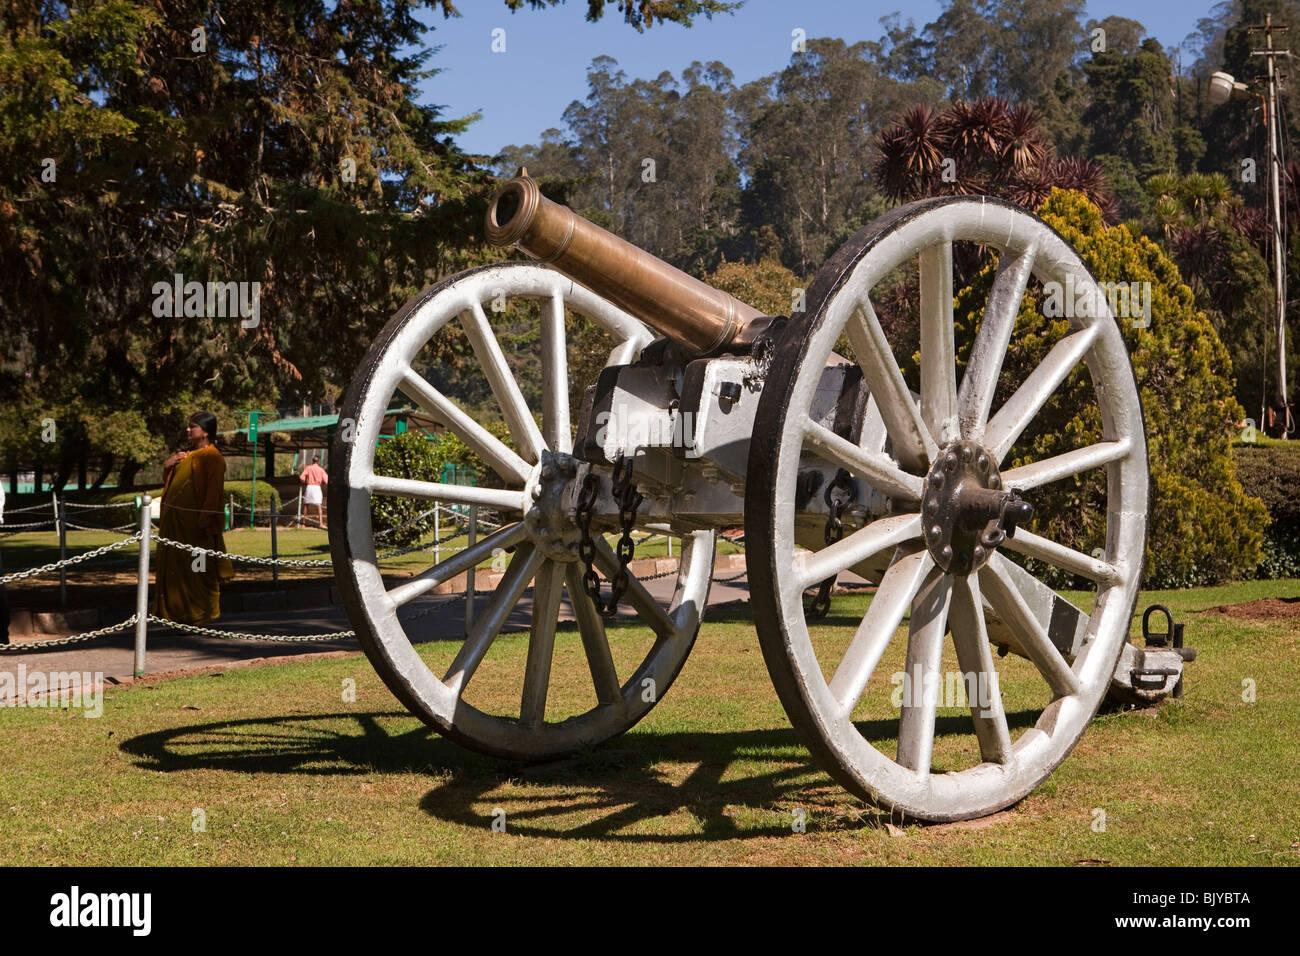 India, Tamil Nadu, Udhagamandalam (Ooty), Botanical Gardens, old British colonial field gun - Stock Image